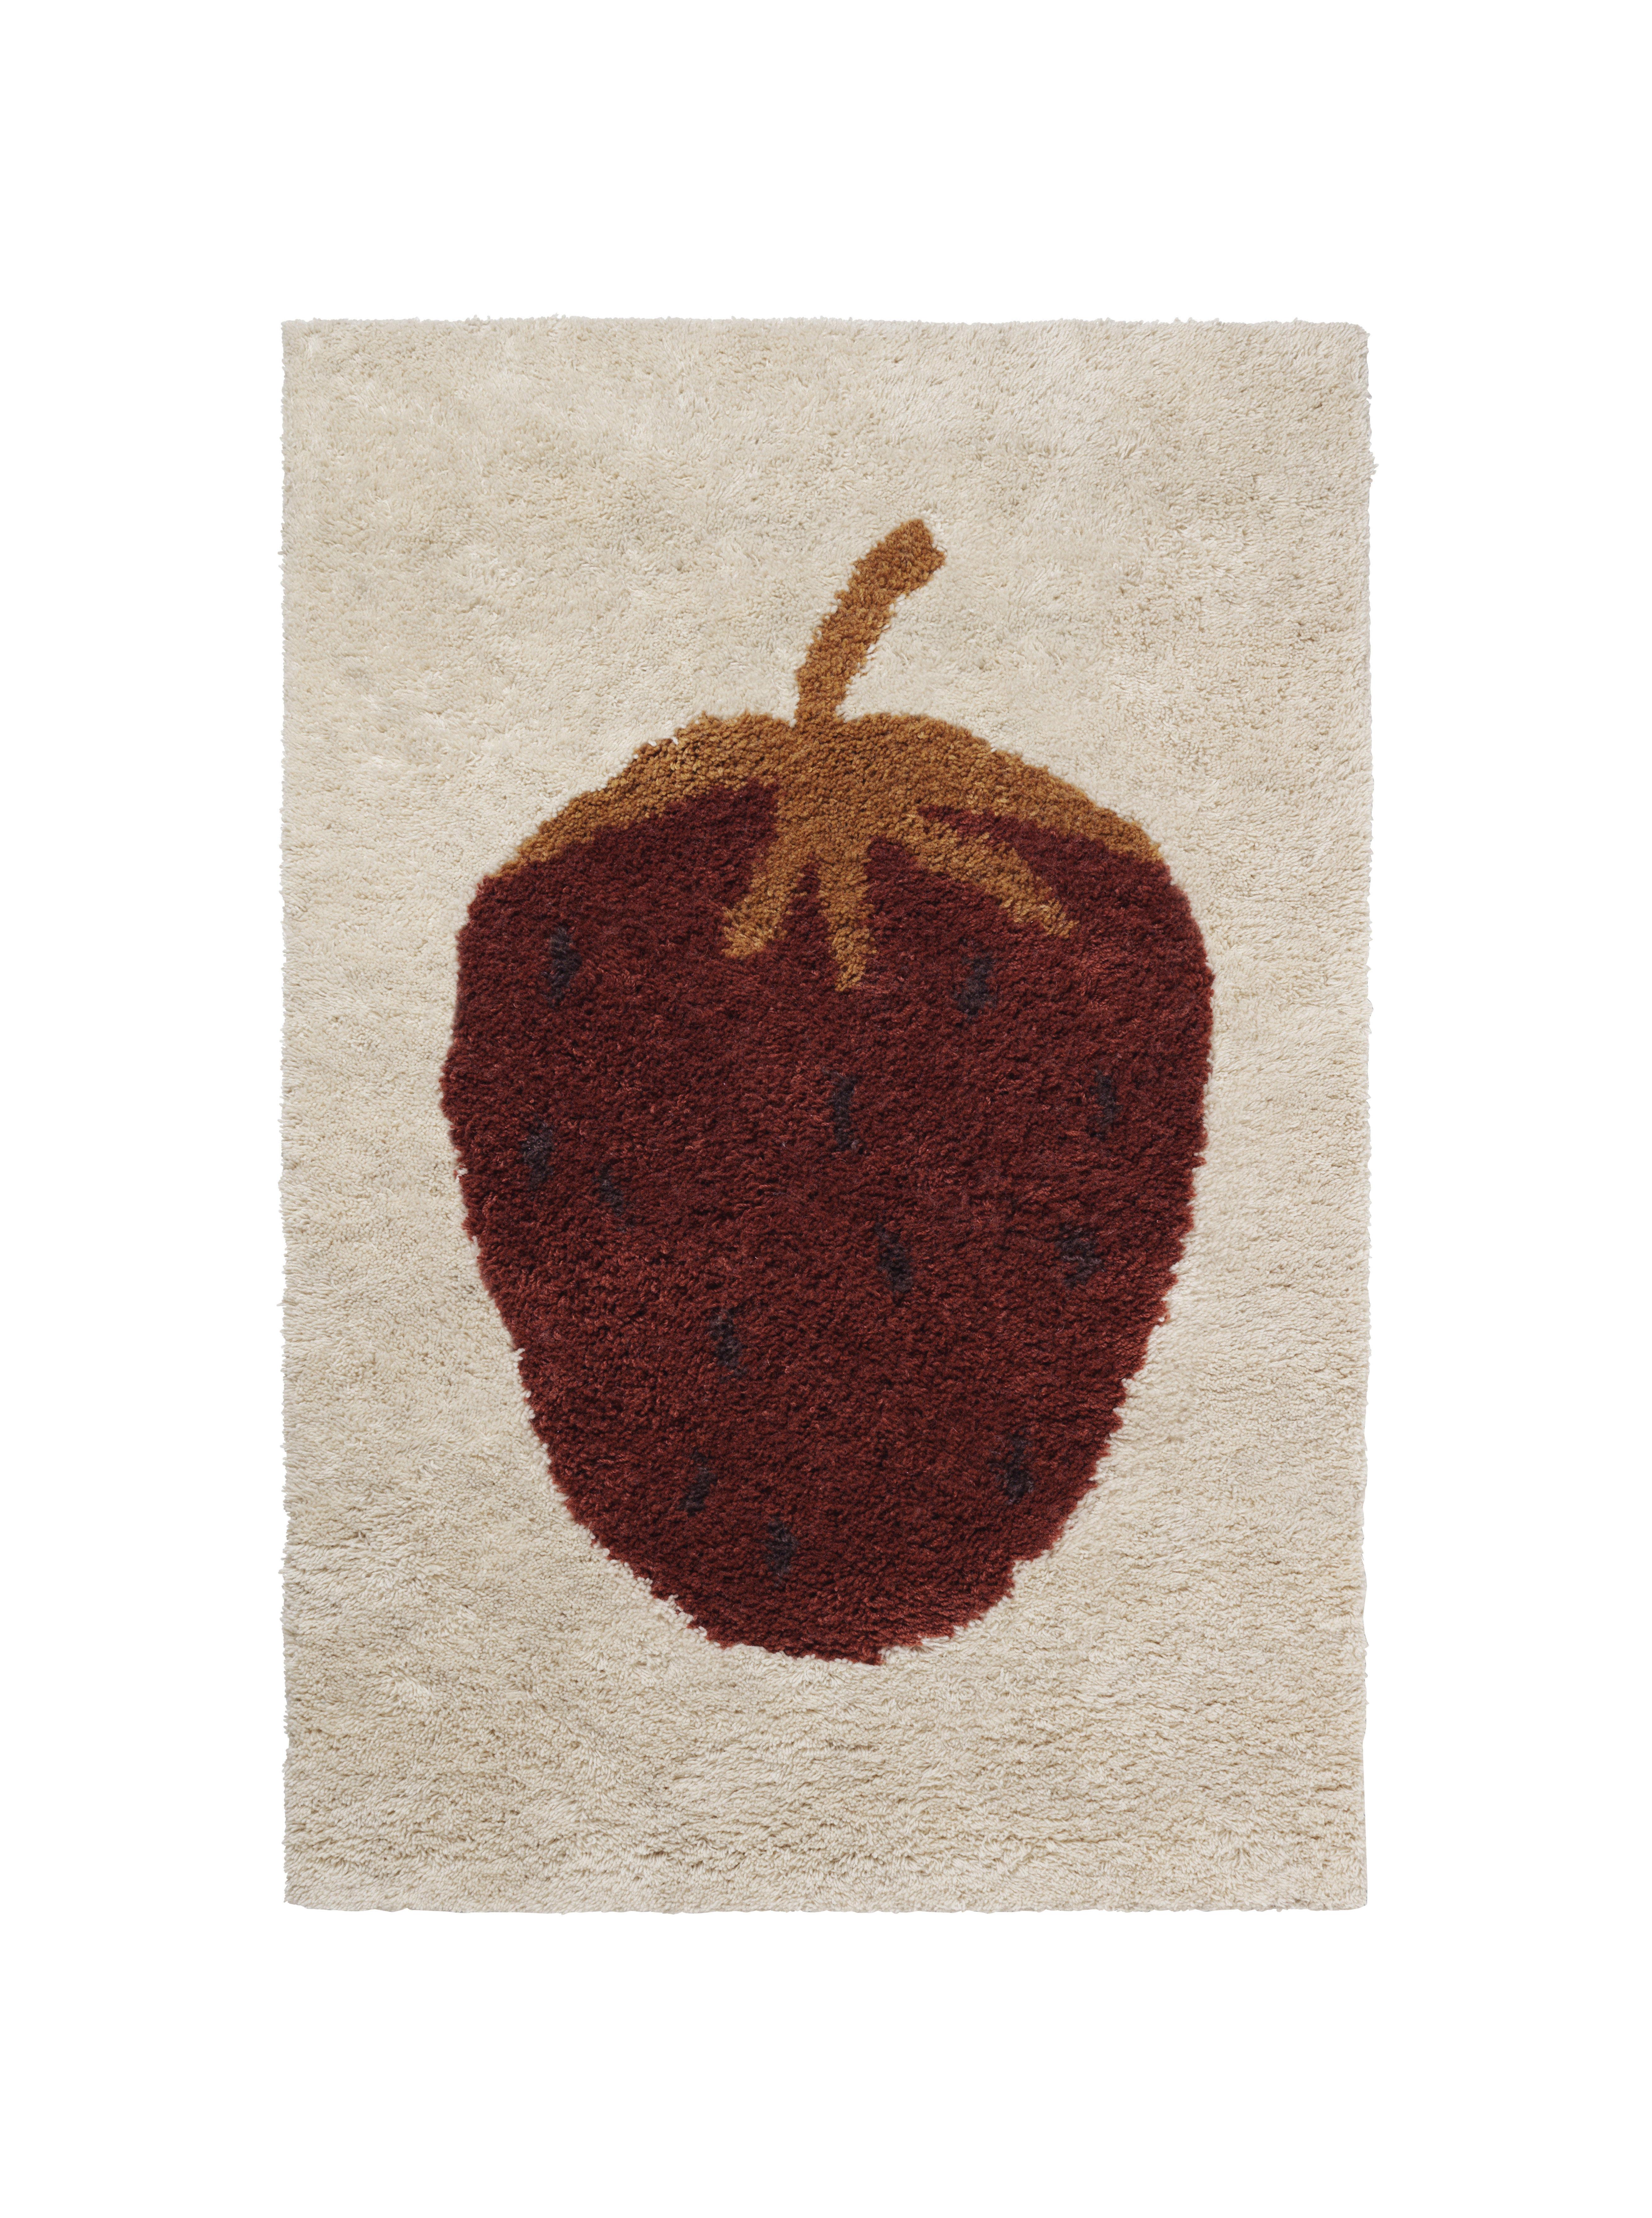 Furniture - Kids Furniture - Fruiticana - Fraise Rug - / Small - Tissé main by Ferm Living - Fraise - Cotton, Wool